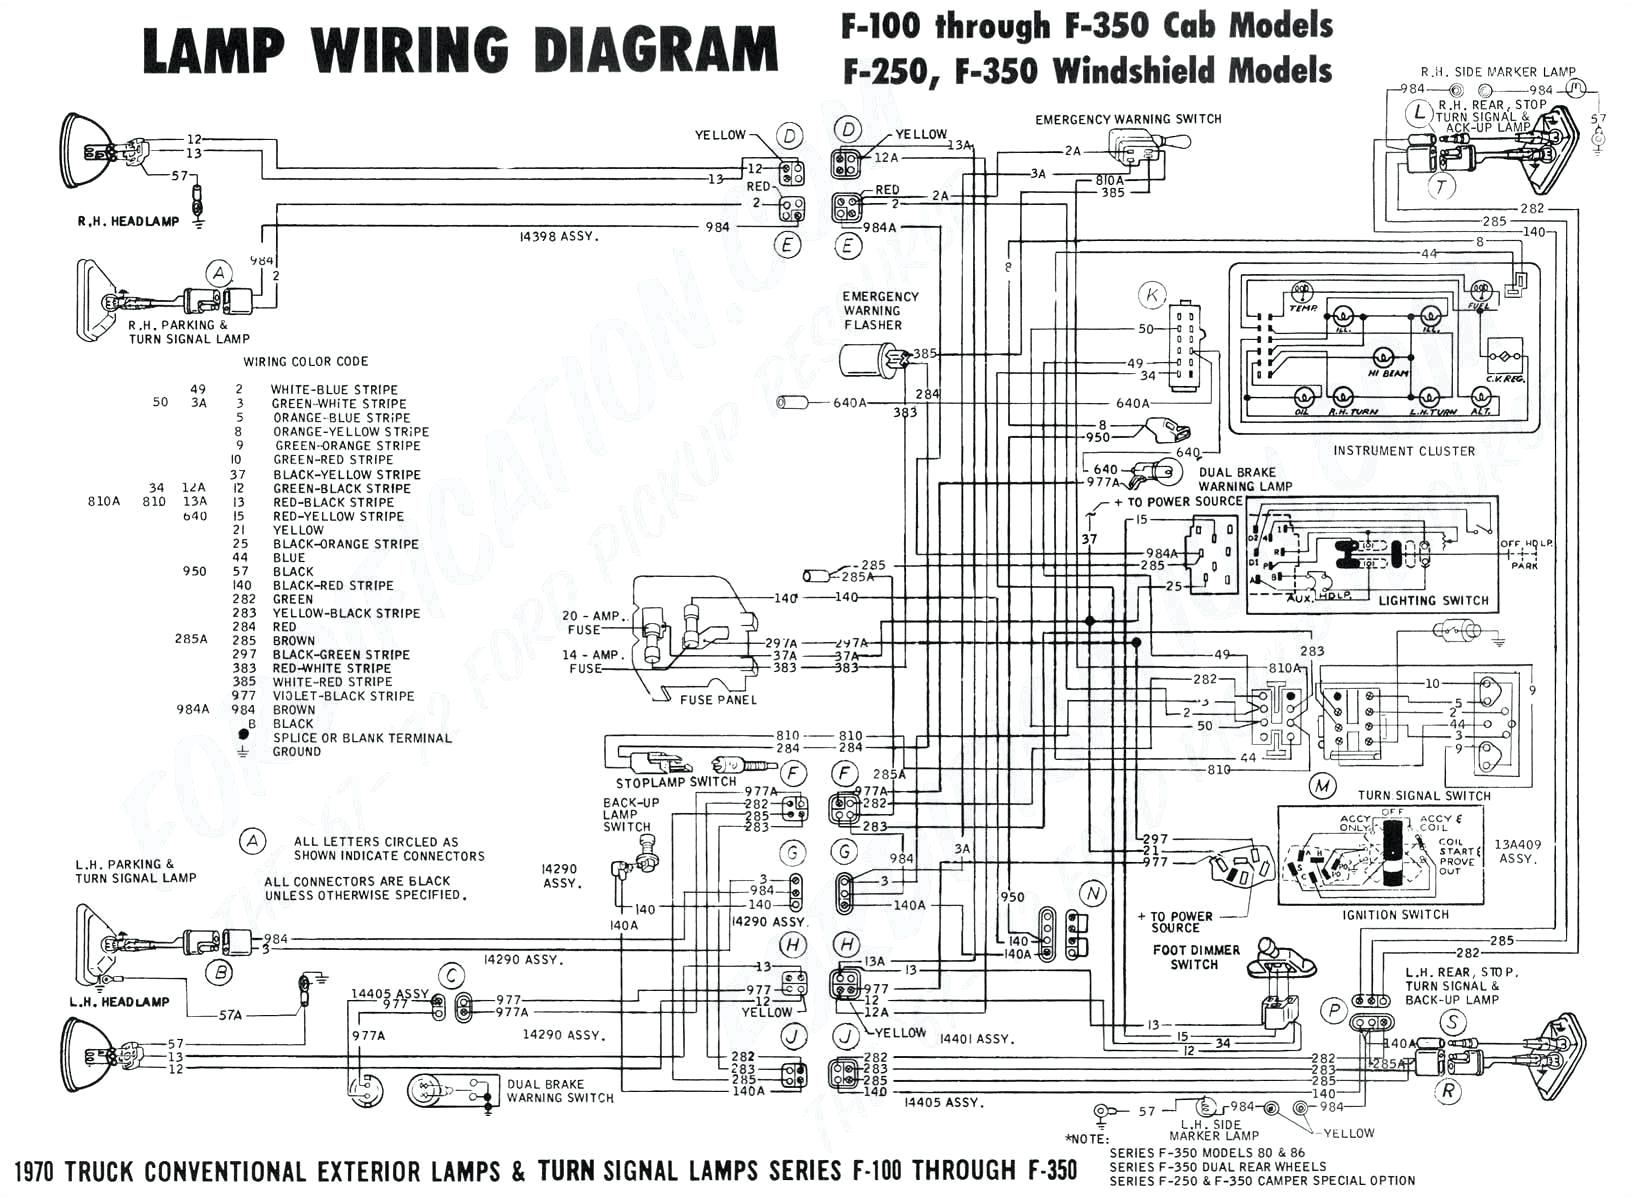 2005 Dodge Ram 2500 Tail Light Wiring Diagram 1983 Dodge Ram Wiring Diagram Diagram Base Website Wiring